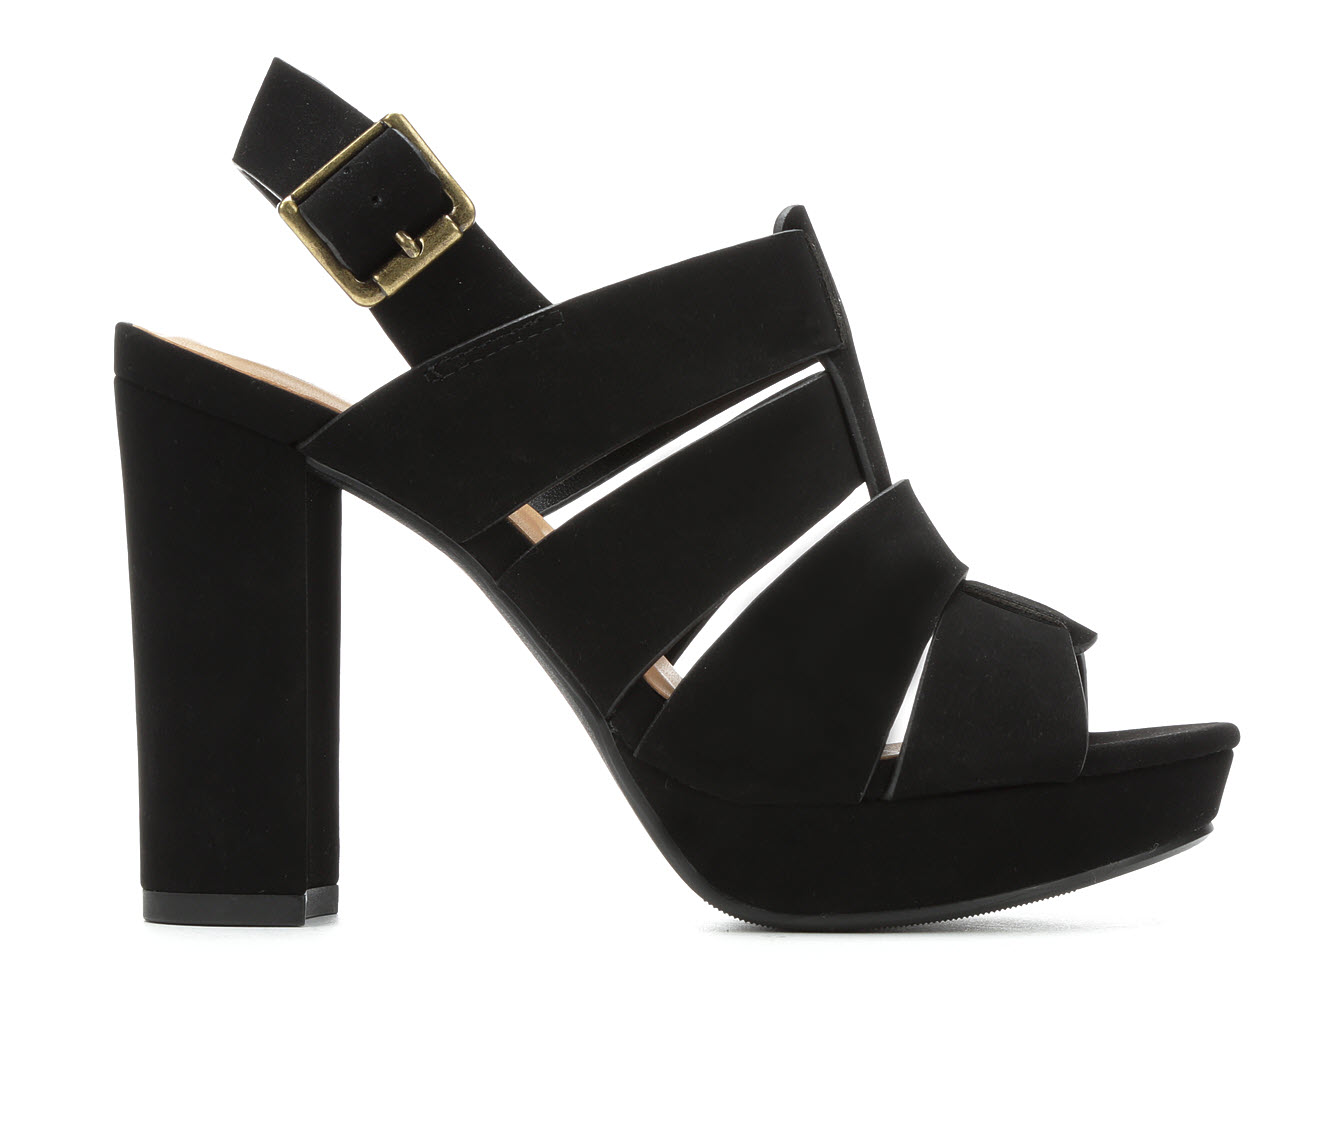 Y-Not Ashleigh Women's Dress Shoe (Black Faux Leather)